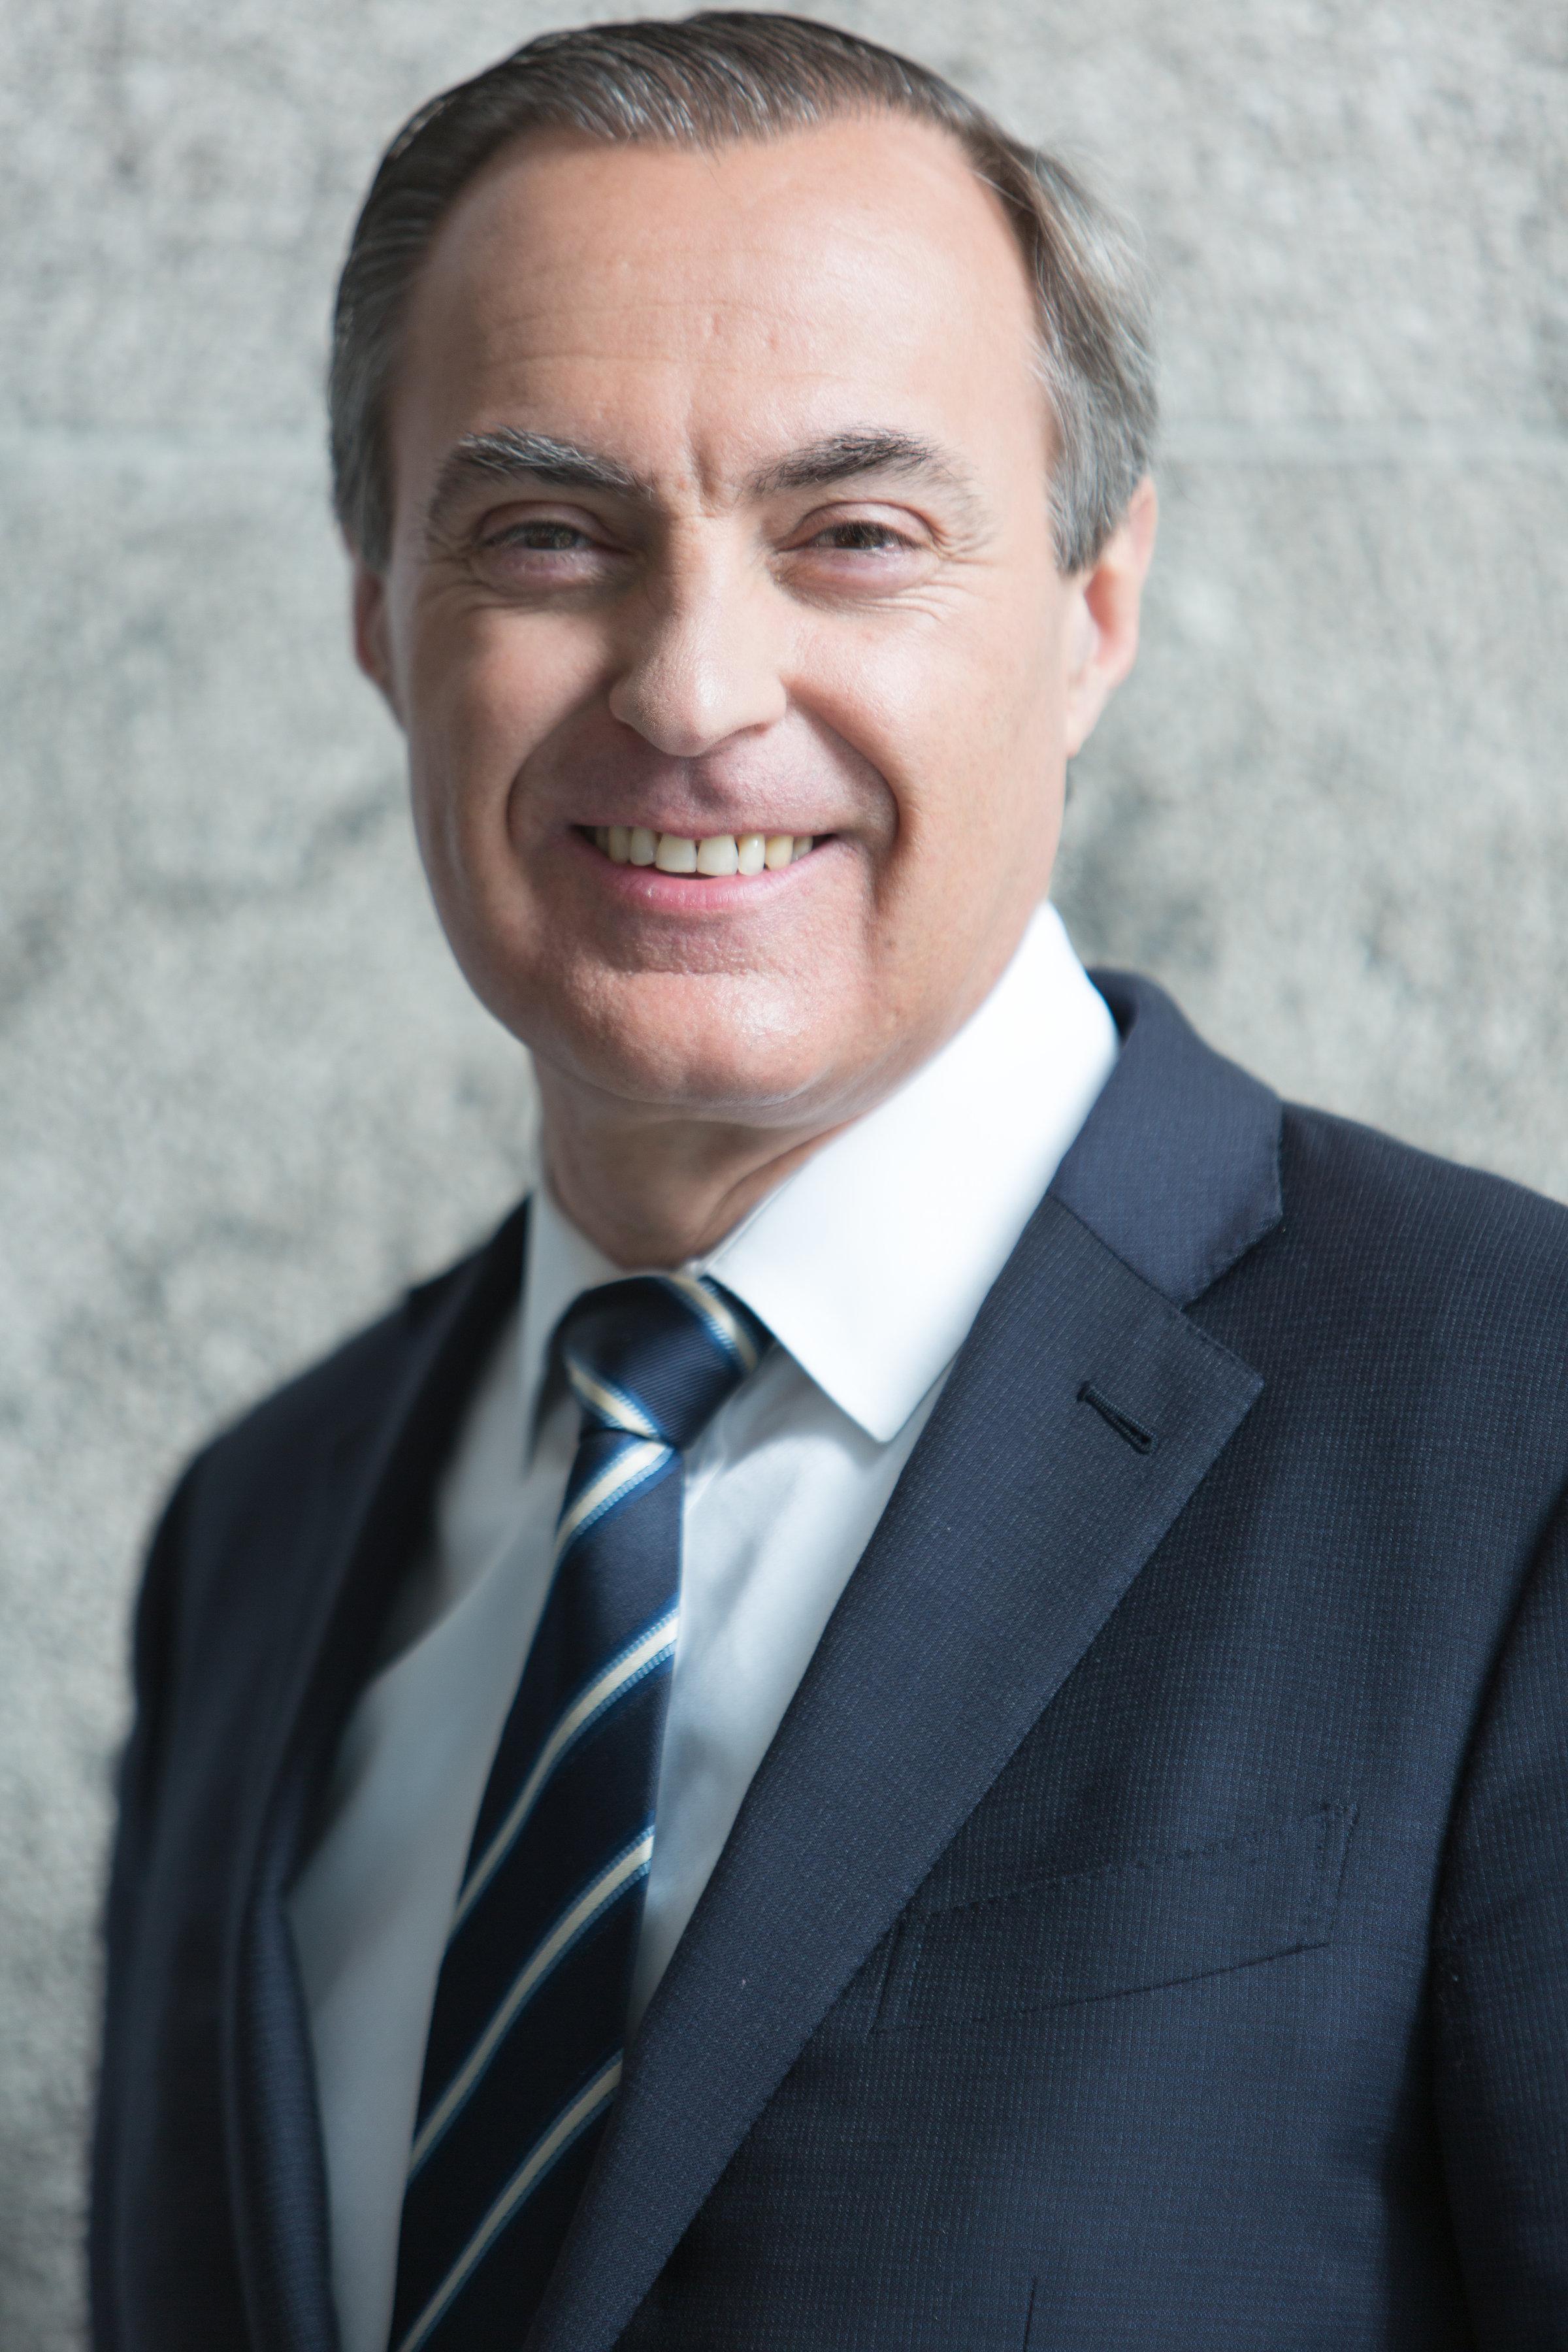 Jean-Christophe Bedos of Maison Birks